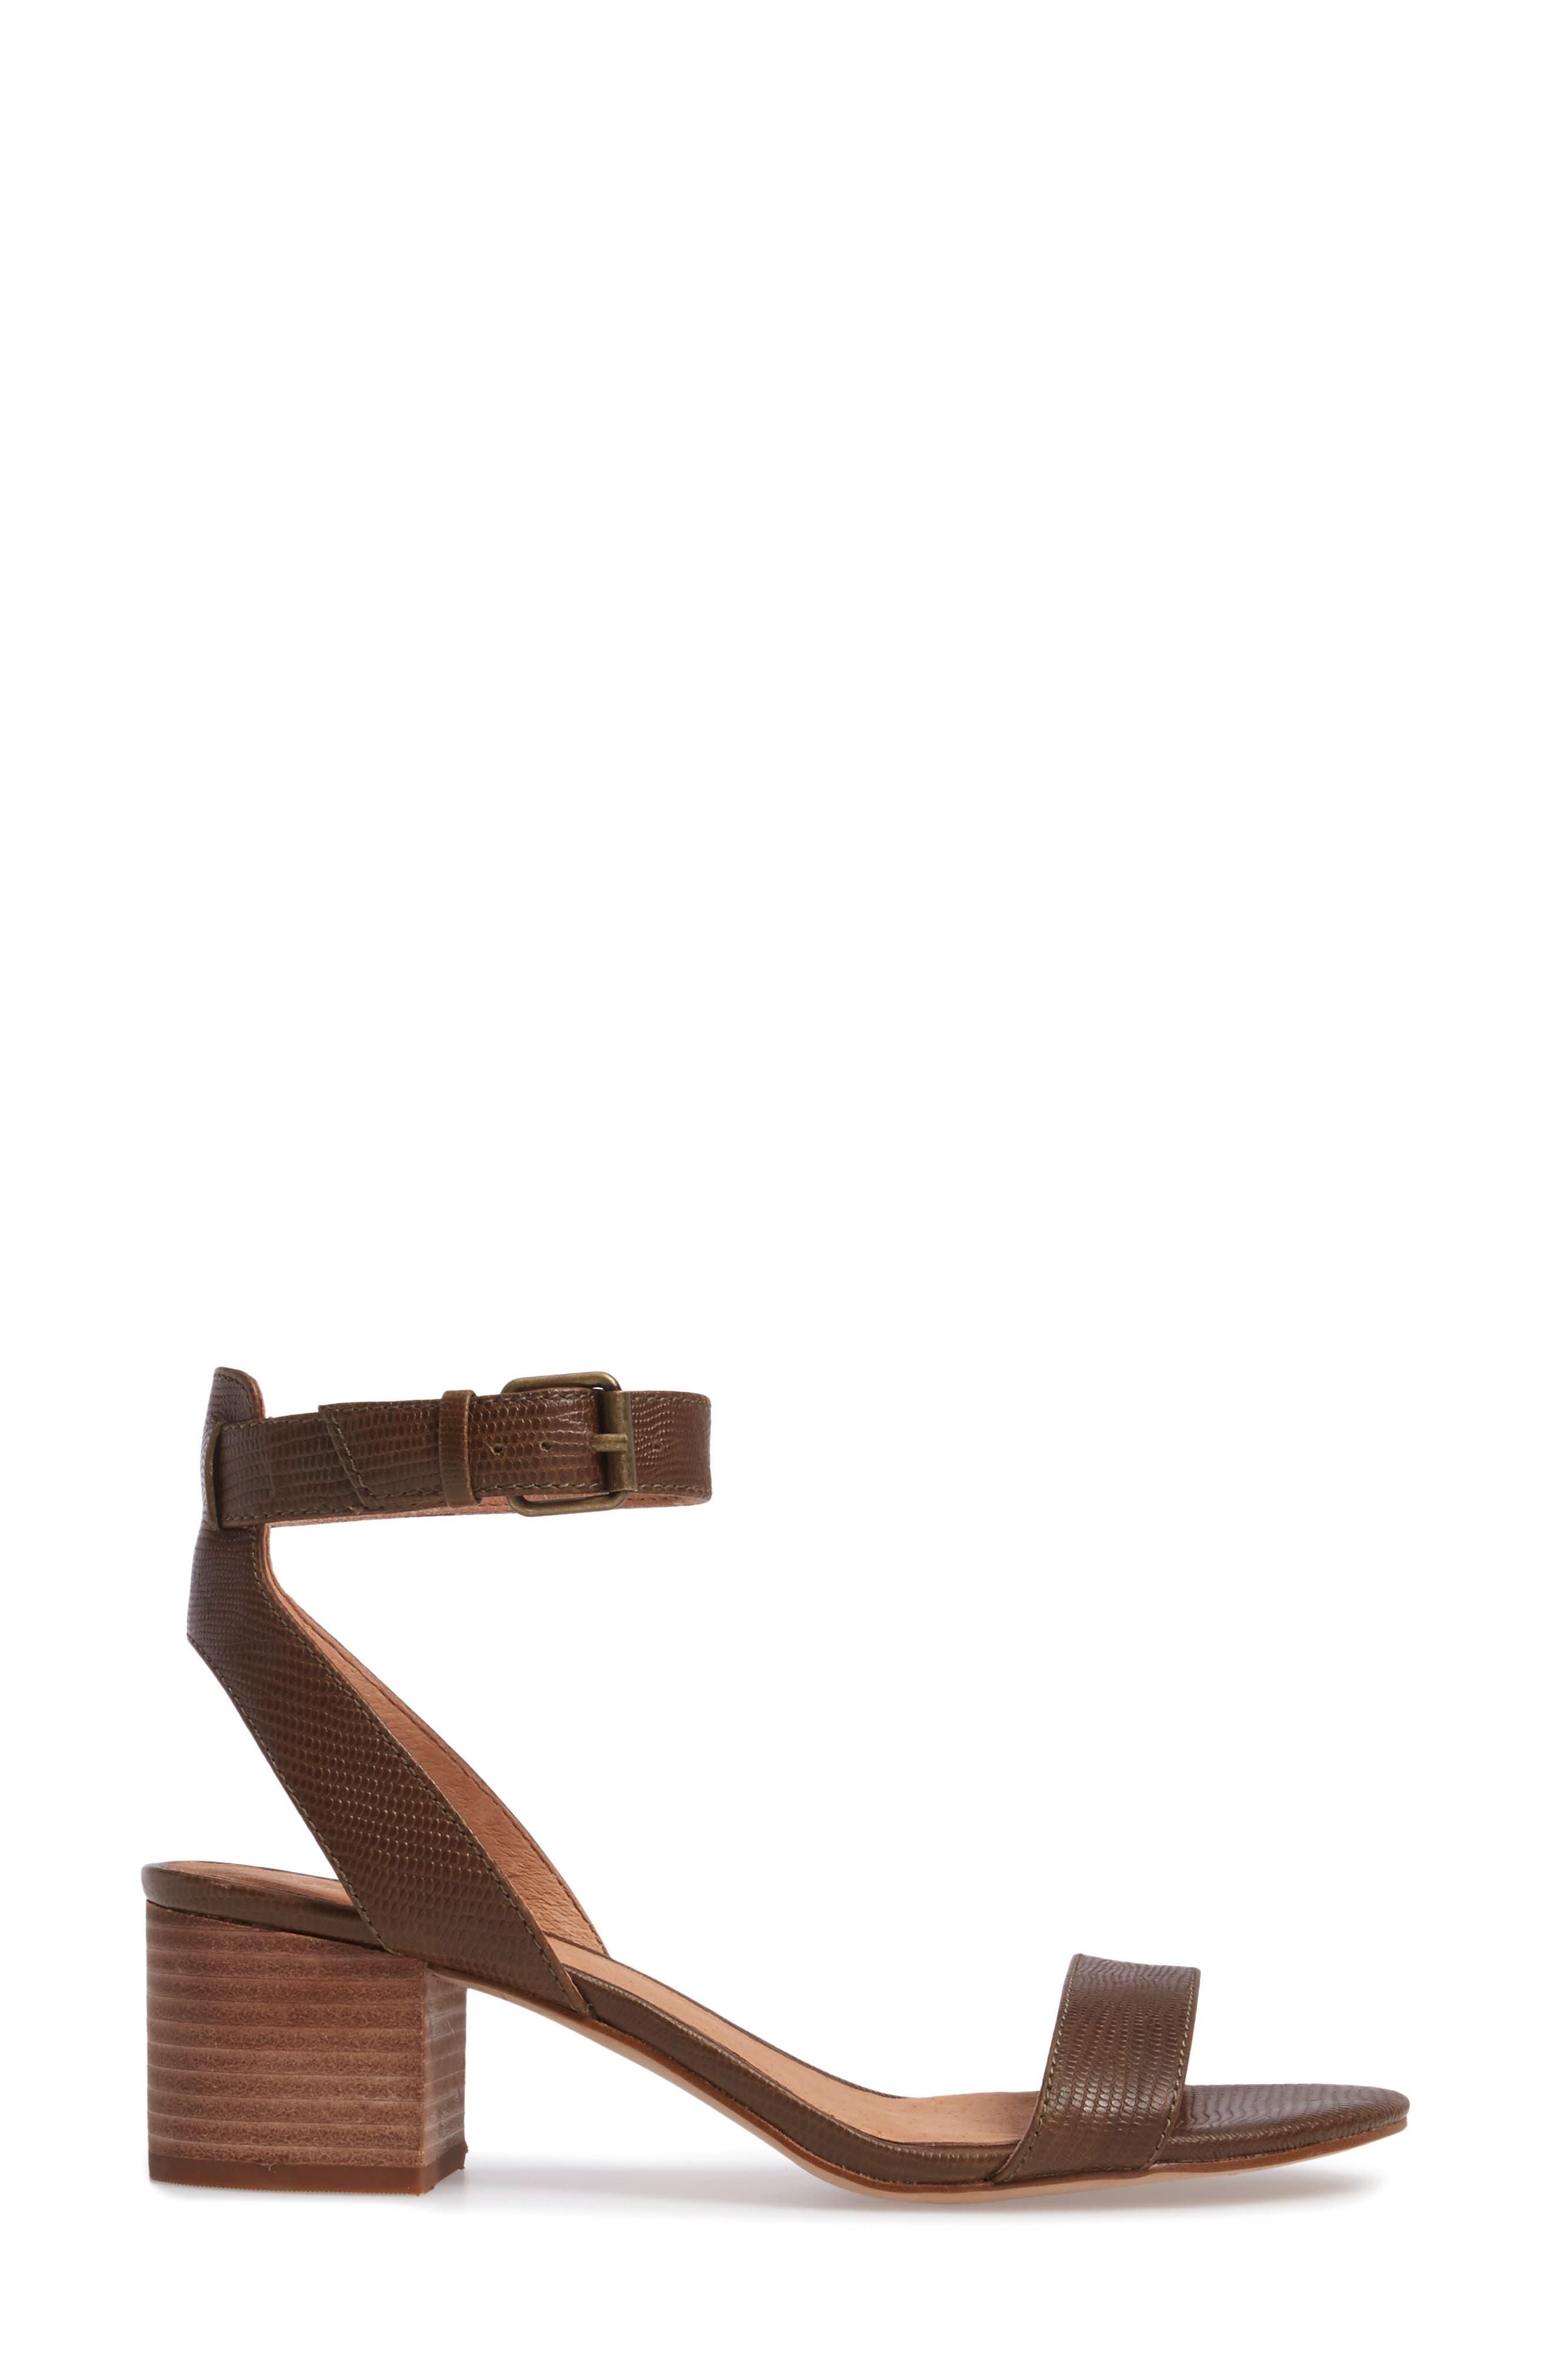 Alice Embossed Ankle Wrap Sandal,                             Alternate thumbnail 3, color,                             250